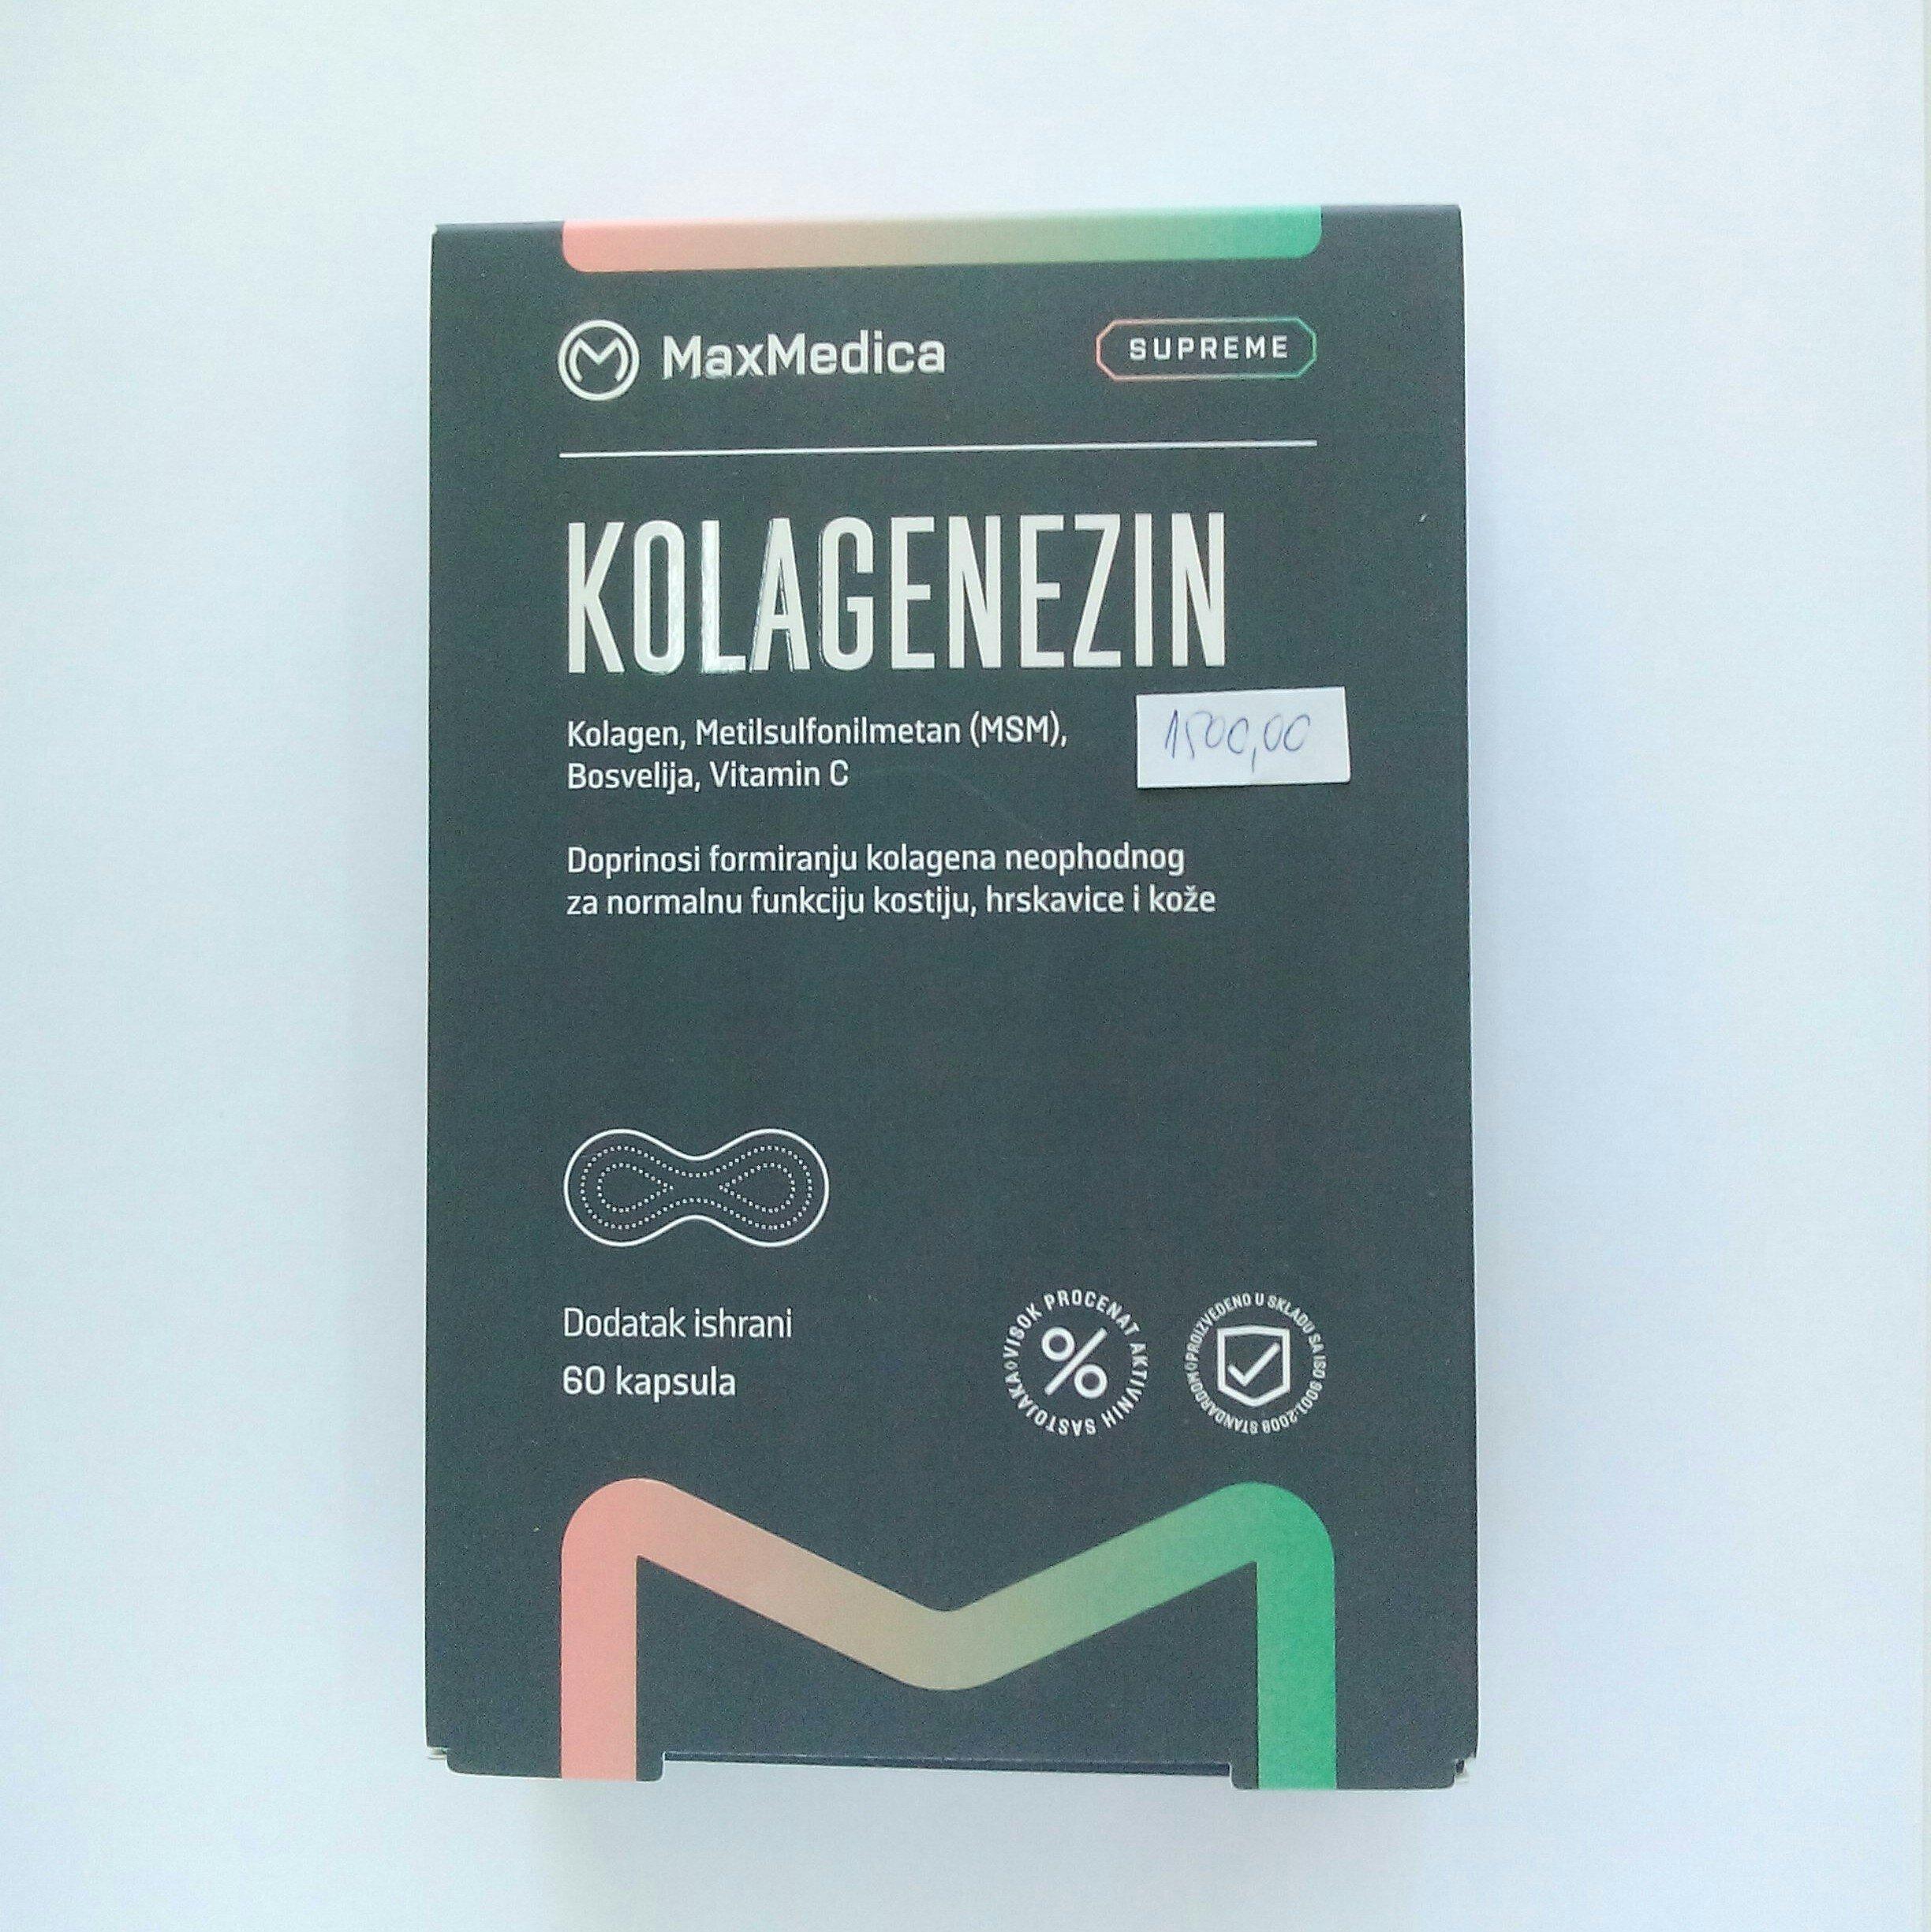 Kolagenezin (kolagen, MSM, Bosvelija, vit C) 60 kps 00371